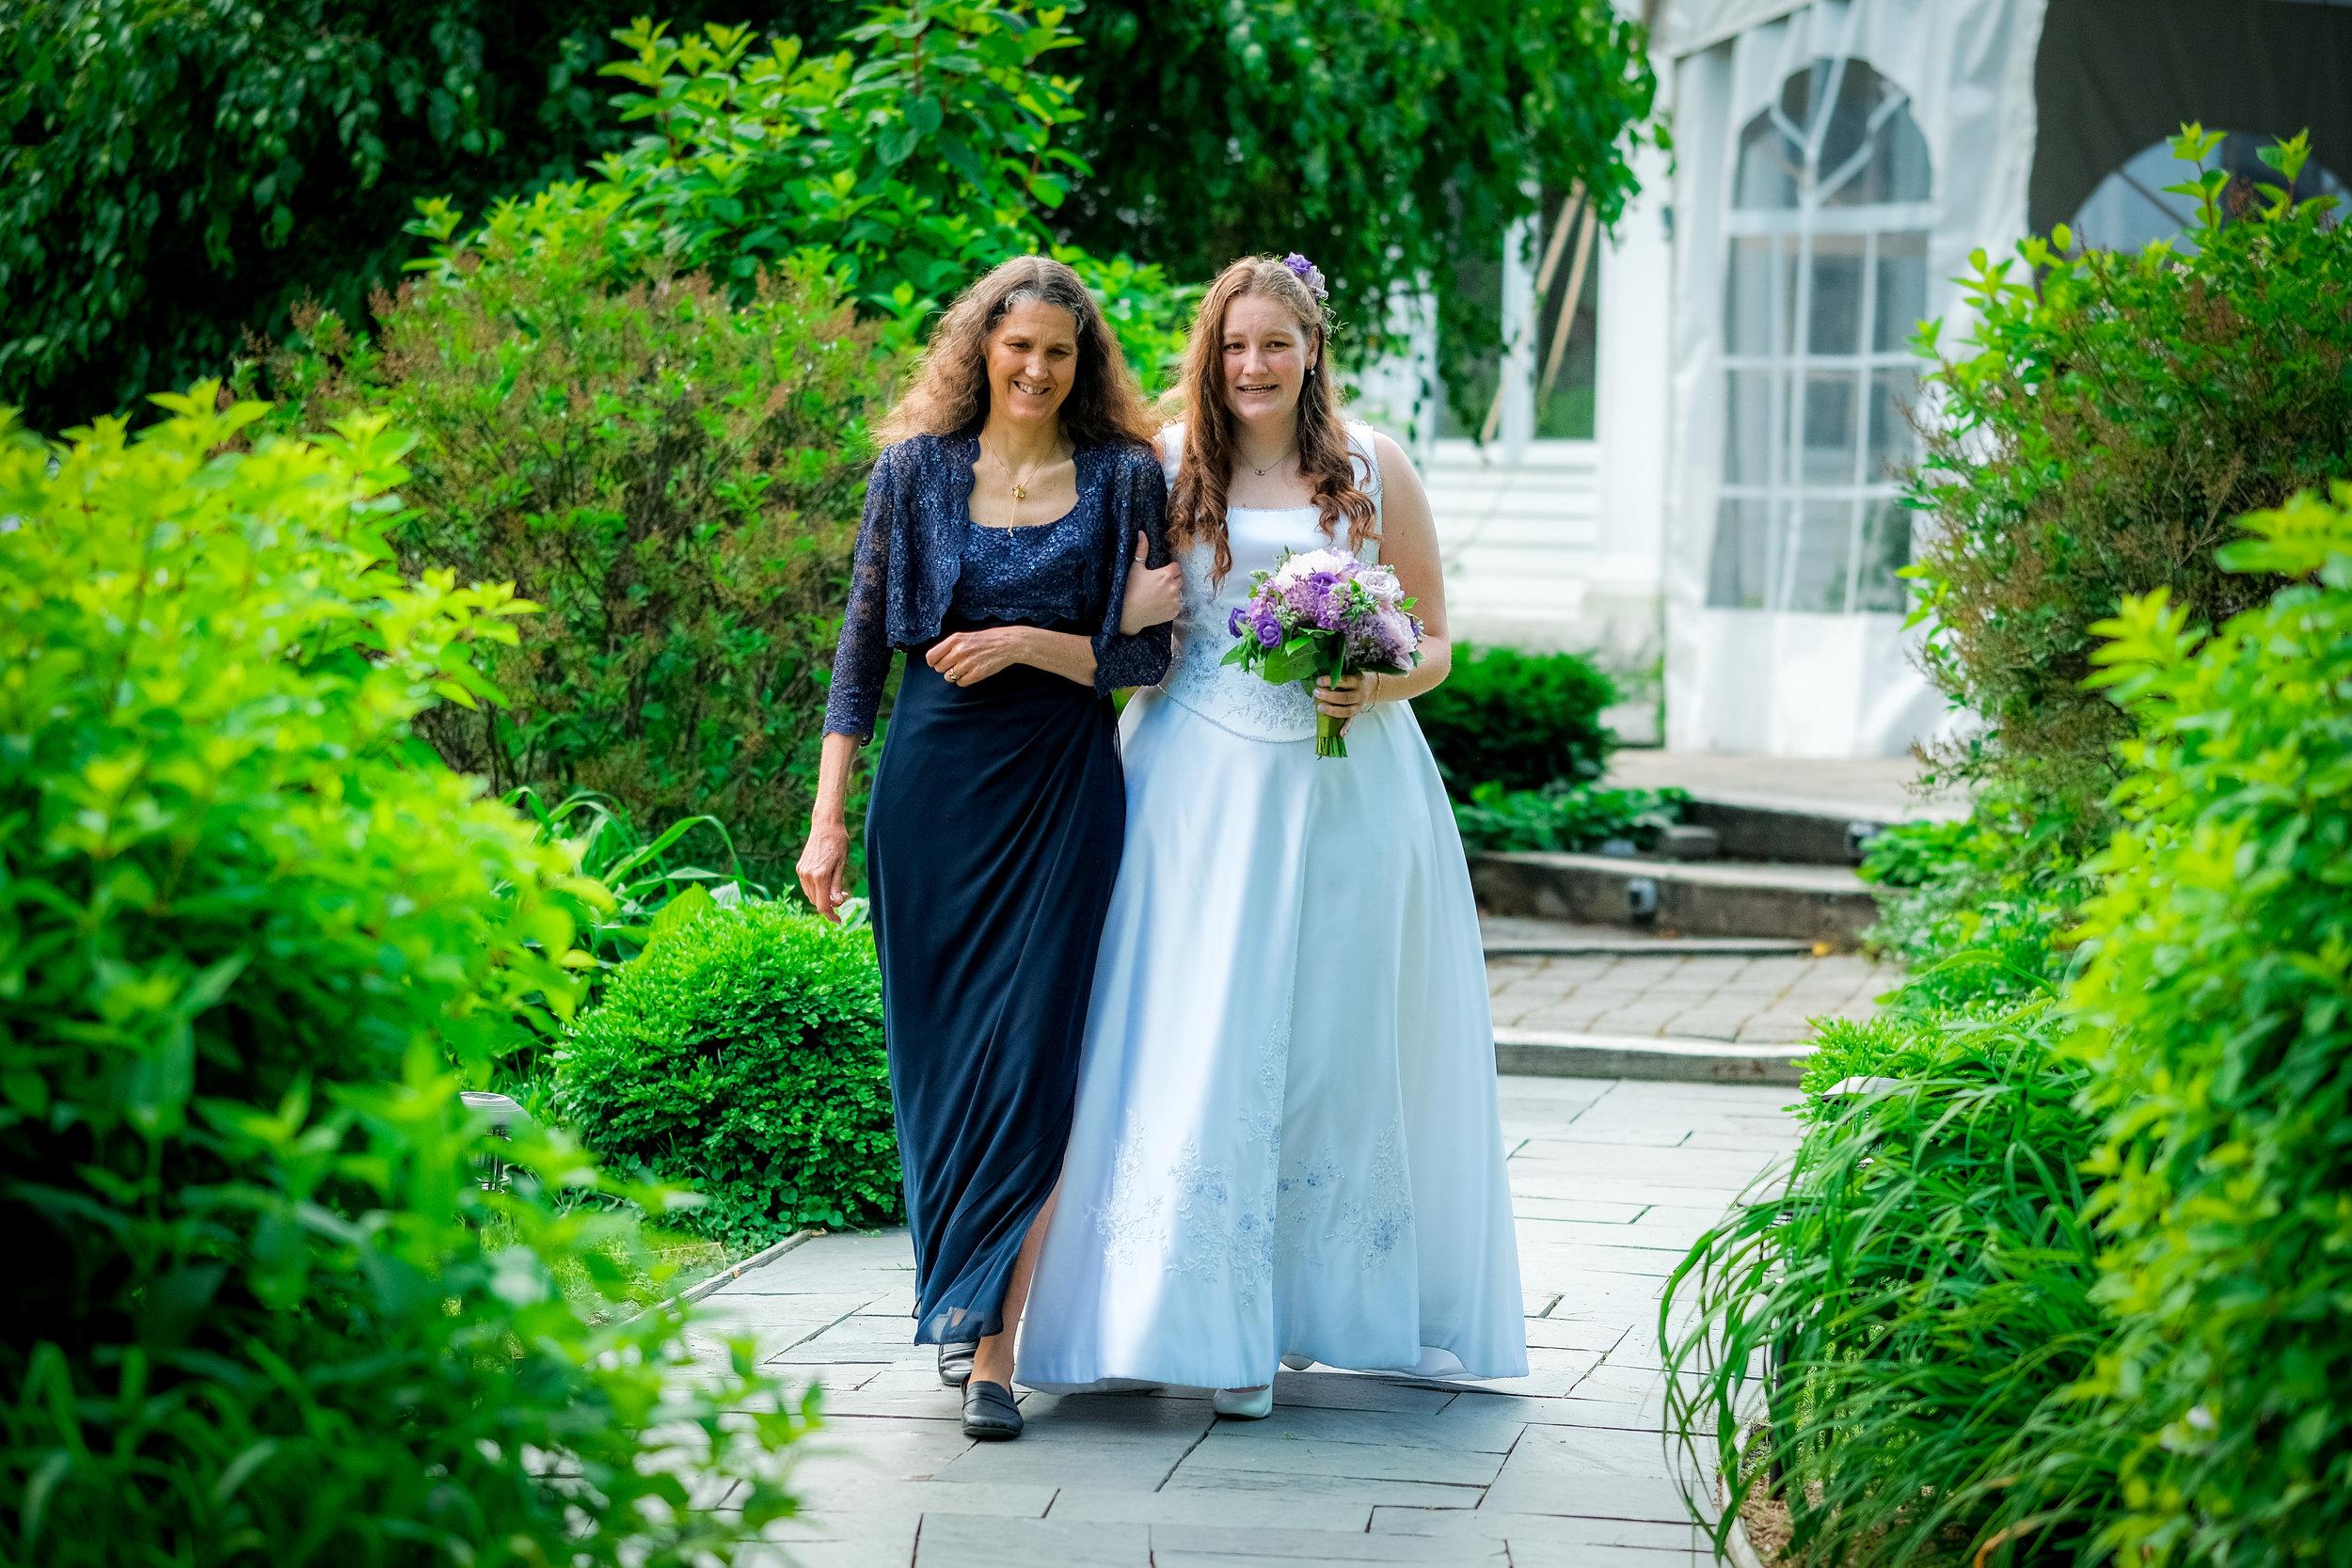 Vermont-Lilac-Inn-Wedding-Photography-542.jpg